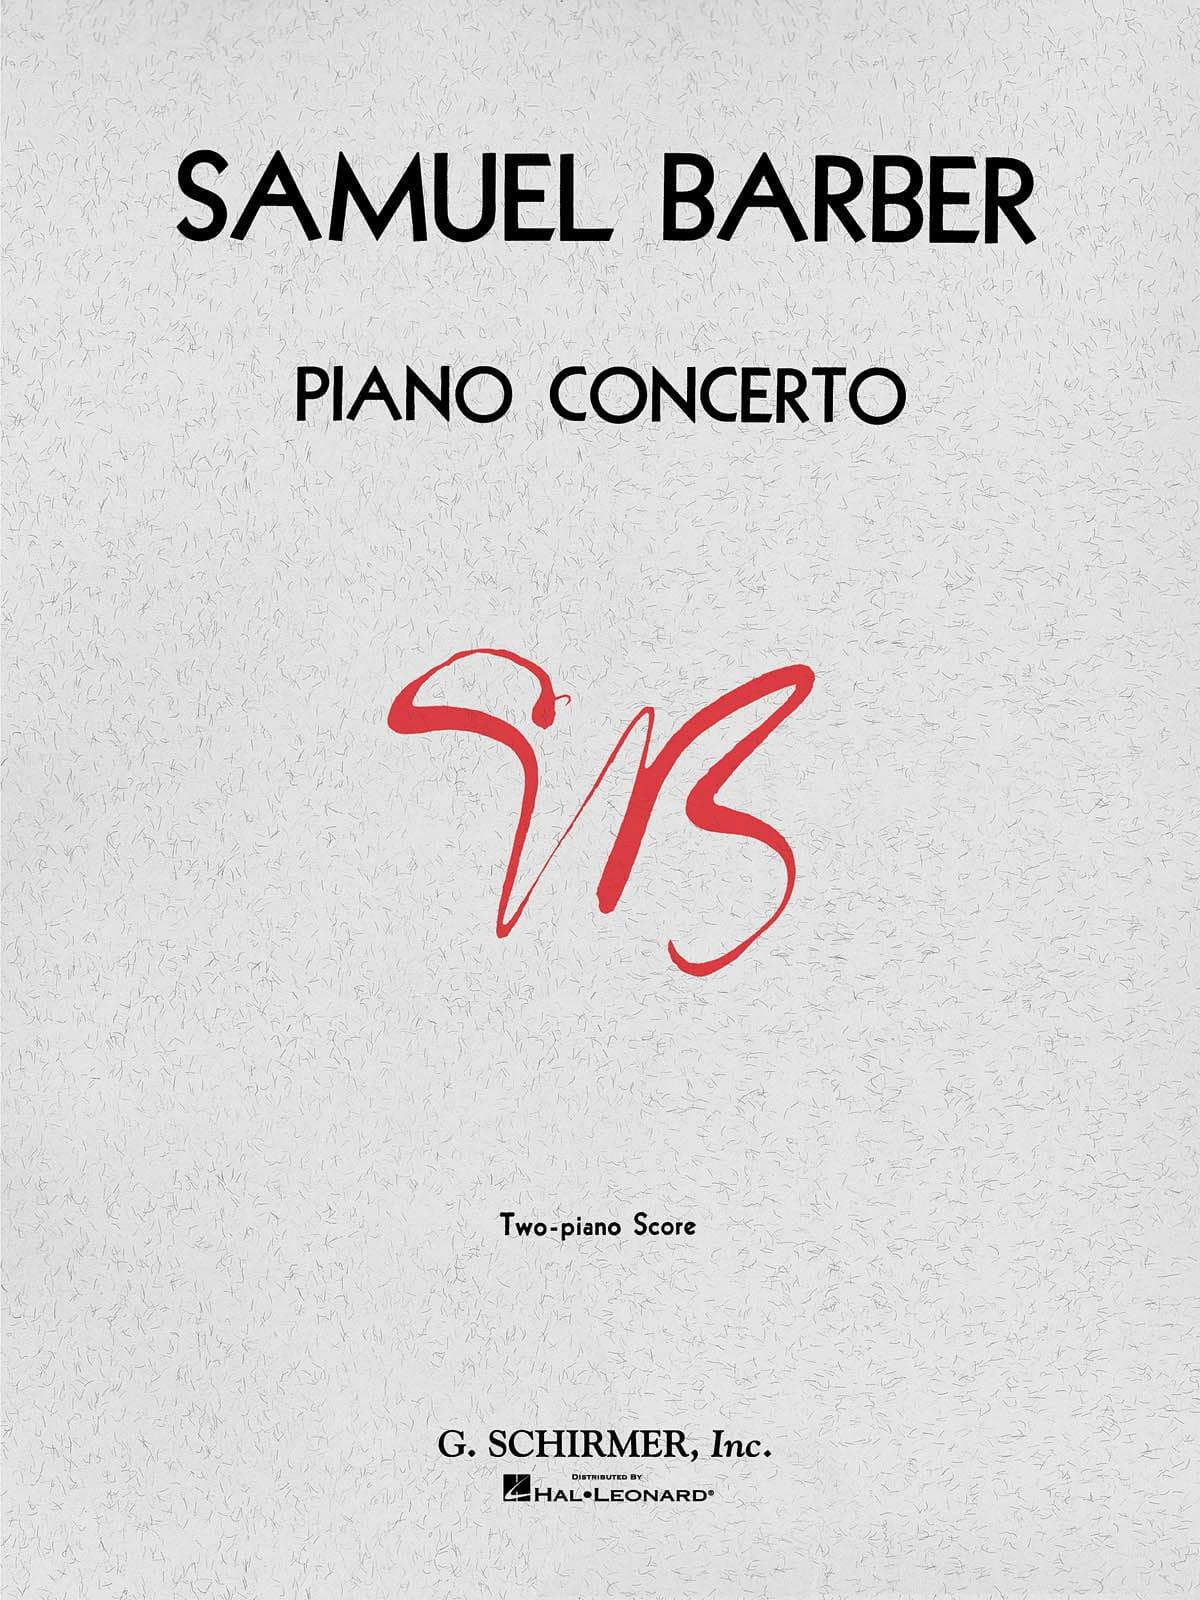 Concerto Pour Piano Opus 38 - BARBER - Partition - laflutedepan.com